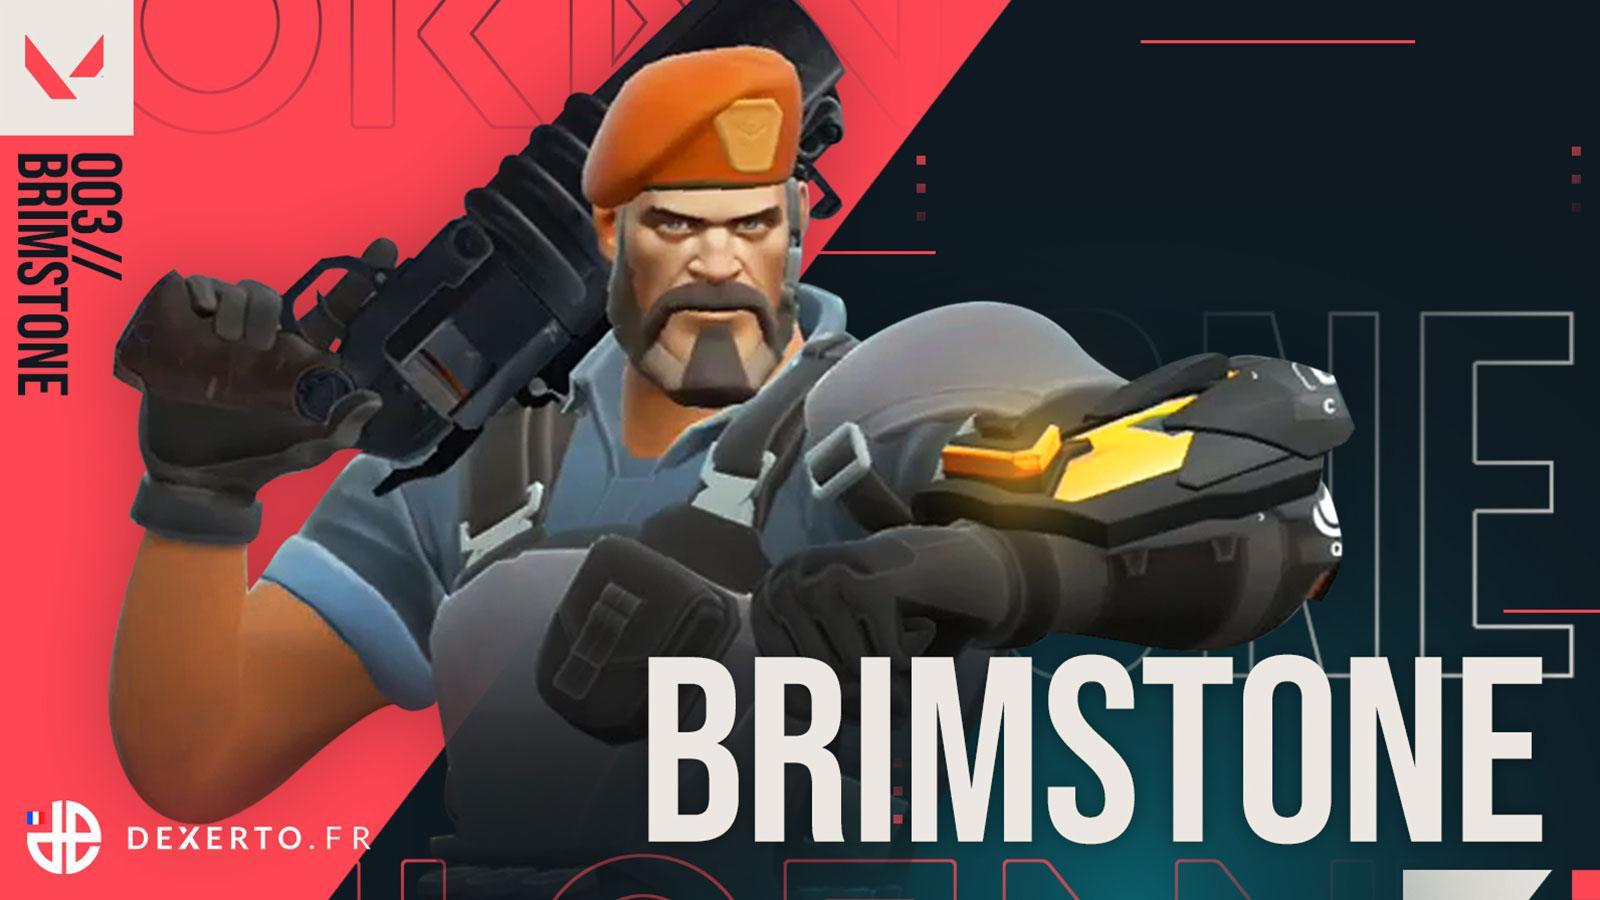 Maniac Brimstone Valorant Riot Games Dexerto